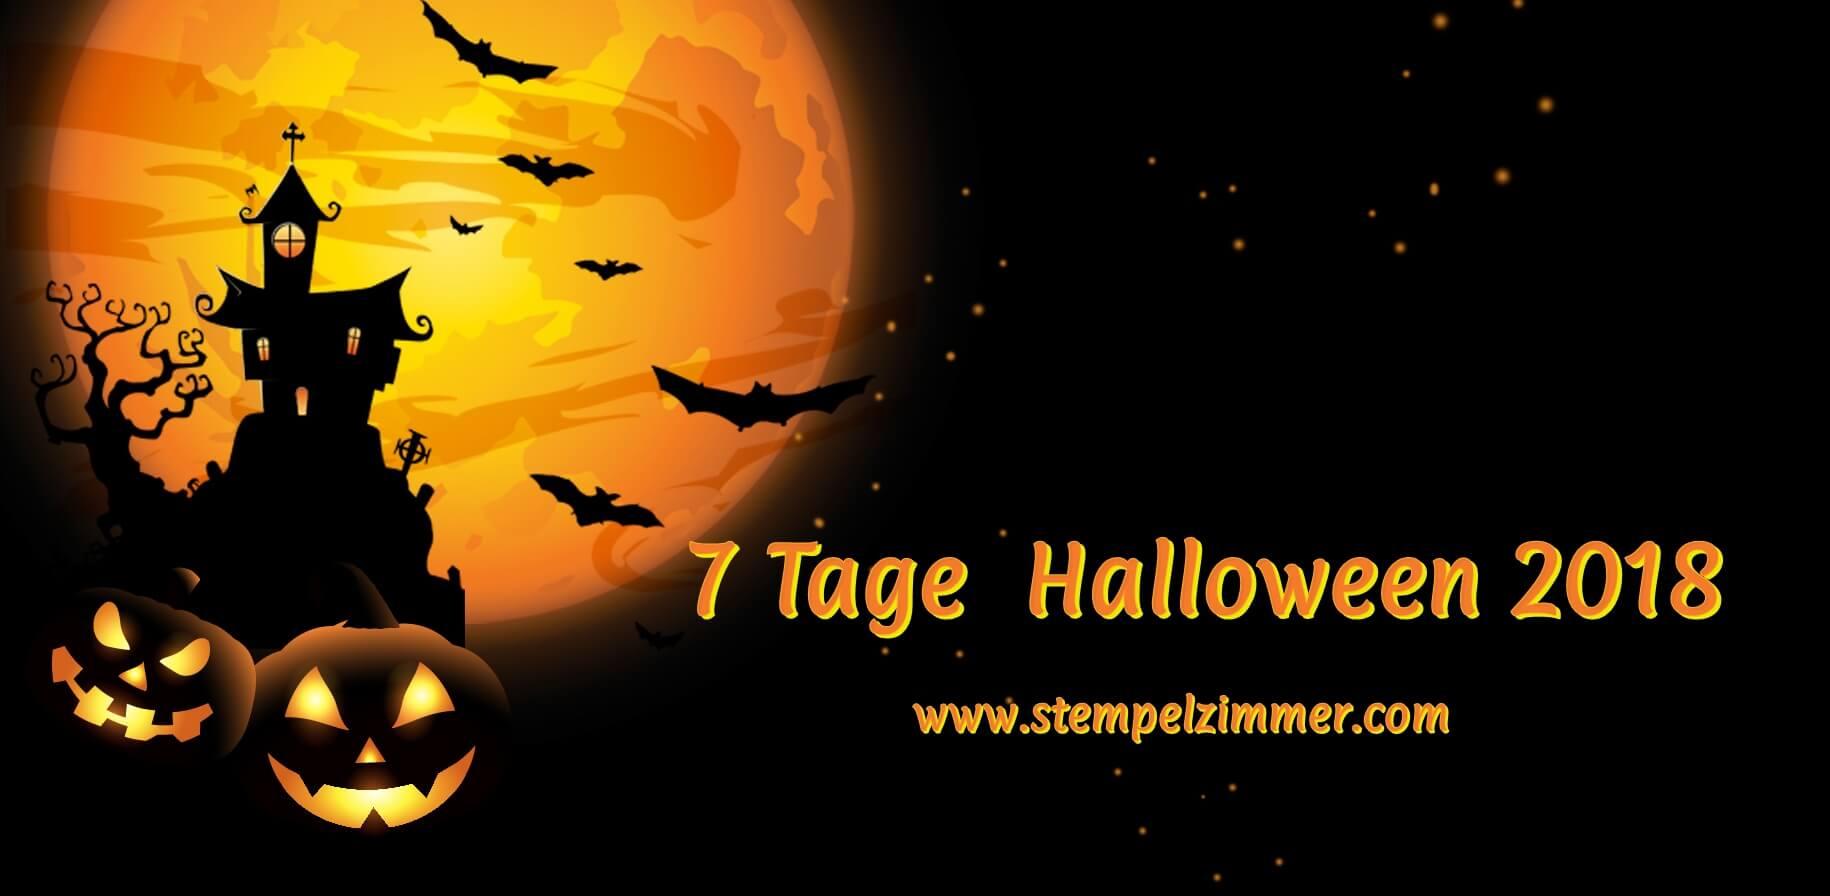 7 Tage Halloween-Stempelzimmer-Blog